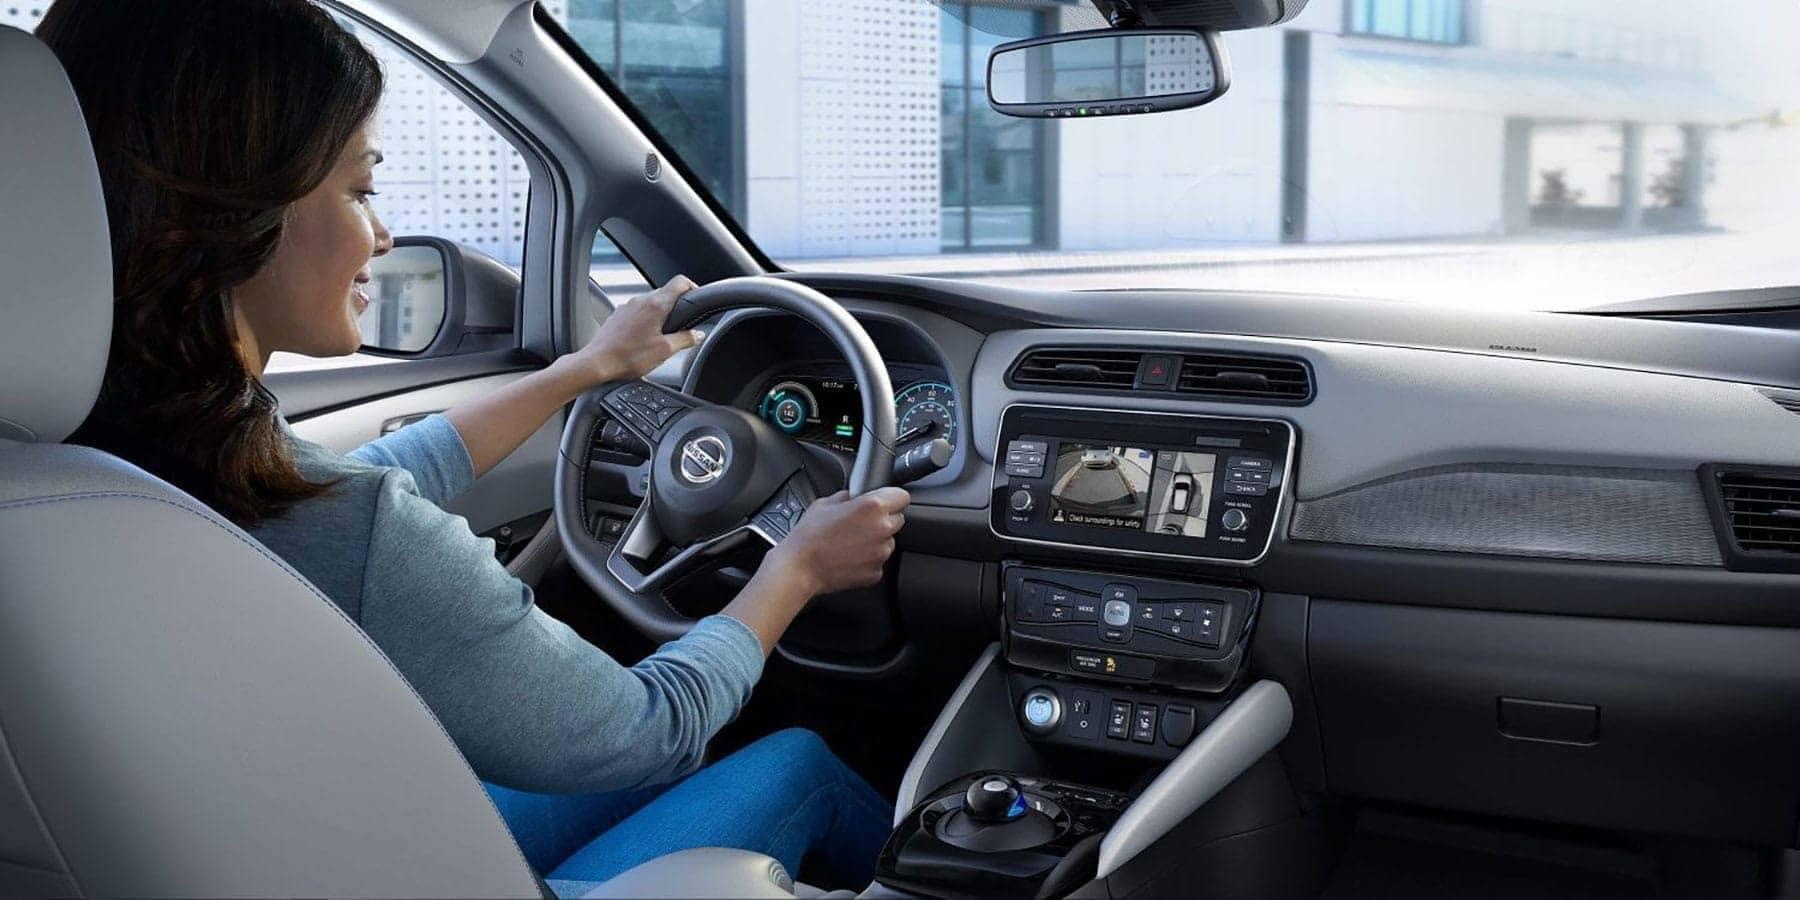 Woman driving a Nissan Leaf